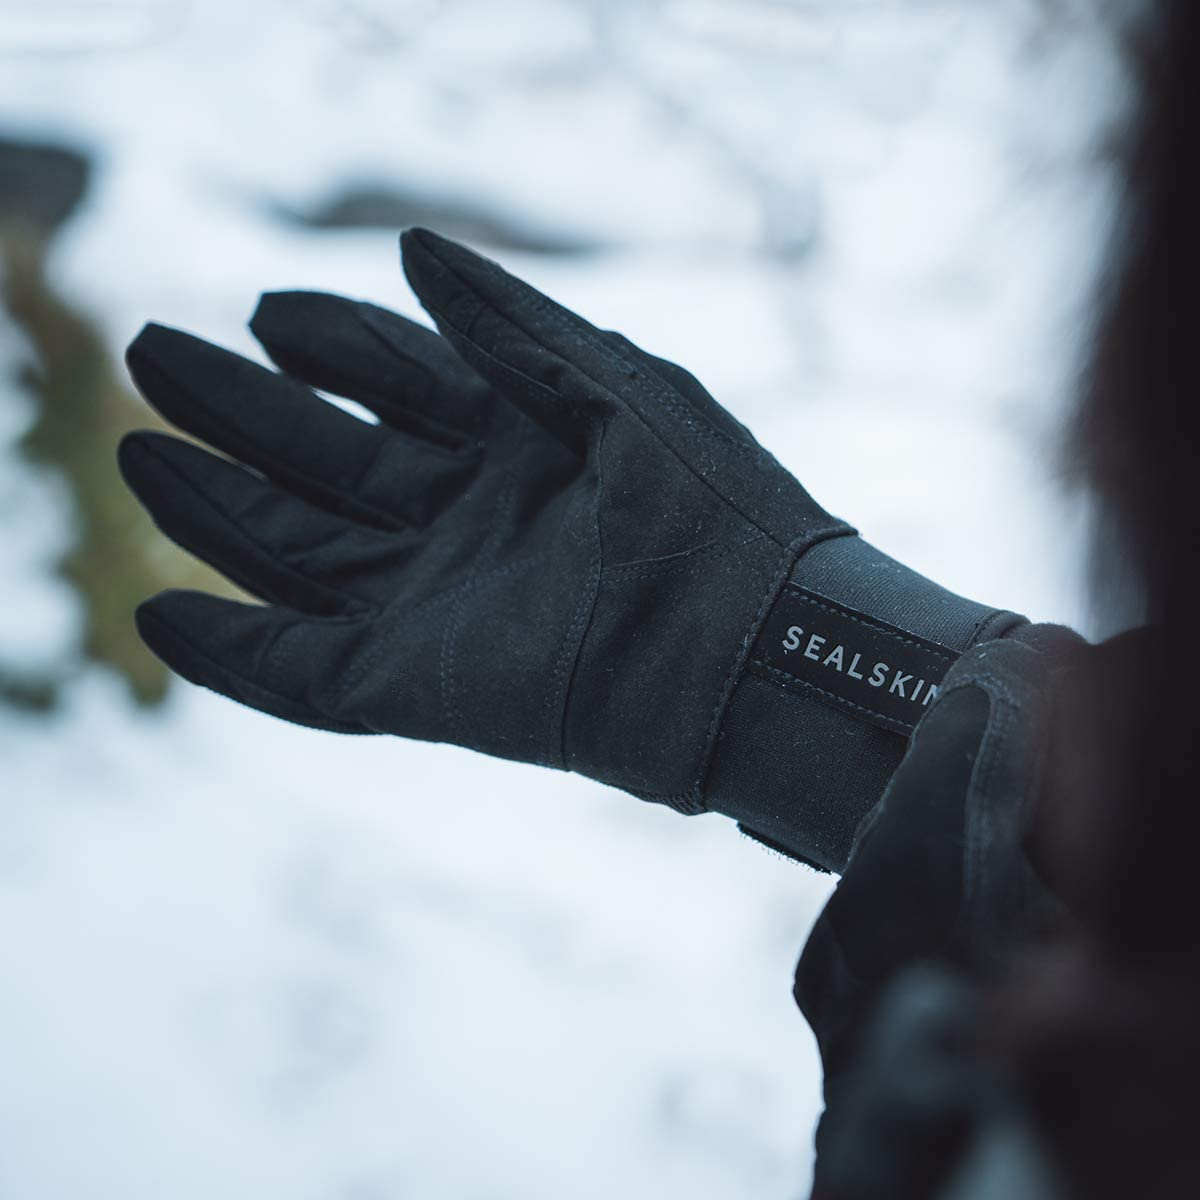 SEALSKINZ Unisex Waterproof All Weather Glove Black XXL